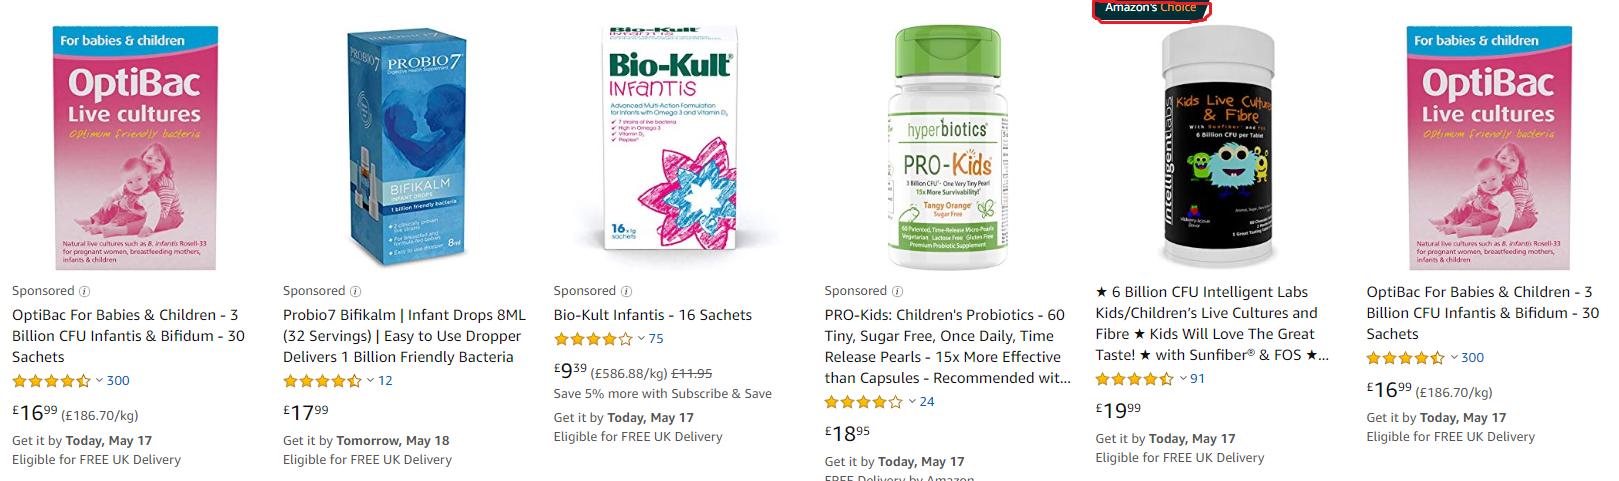 amazon search results probiotics for children